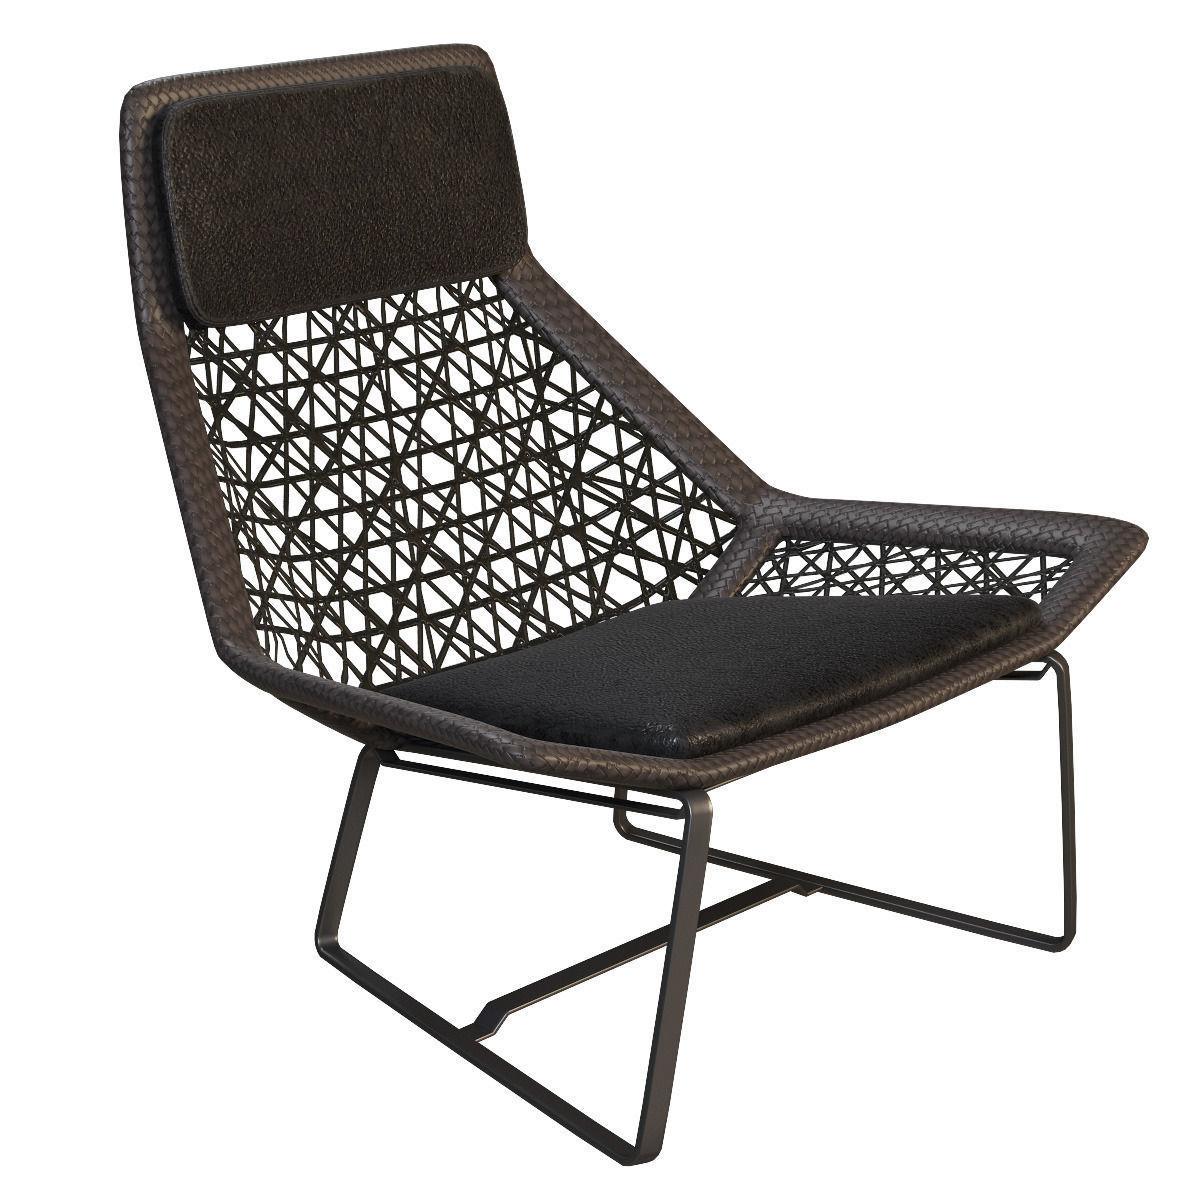 Etonnant Outdoor Wicker Chair Maia Of Kettal 3d Model Max Obj Mtl 3ds Fbx 1 ...